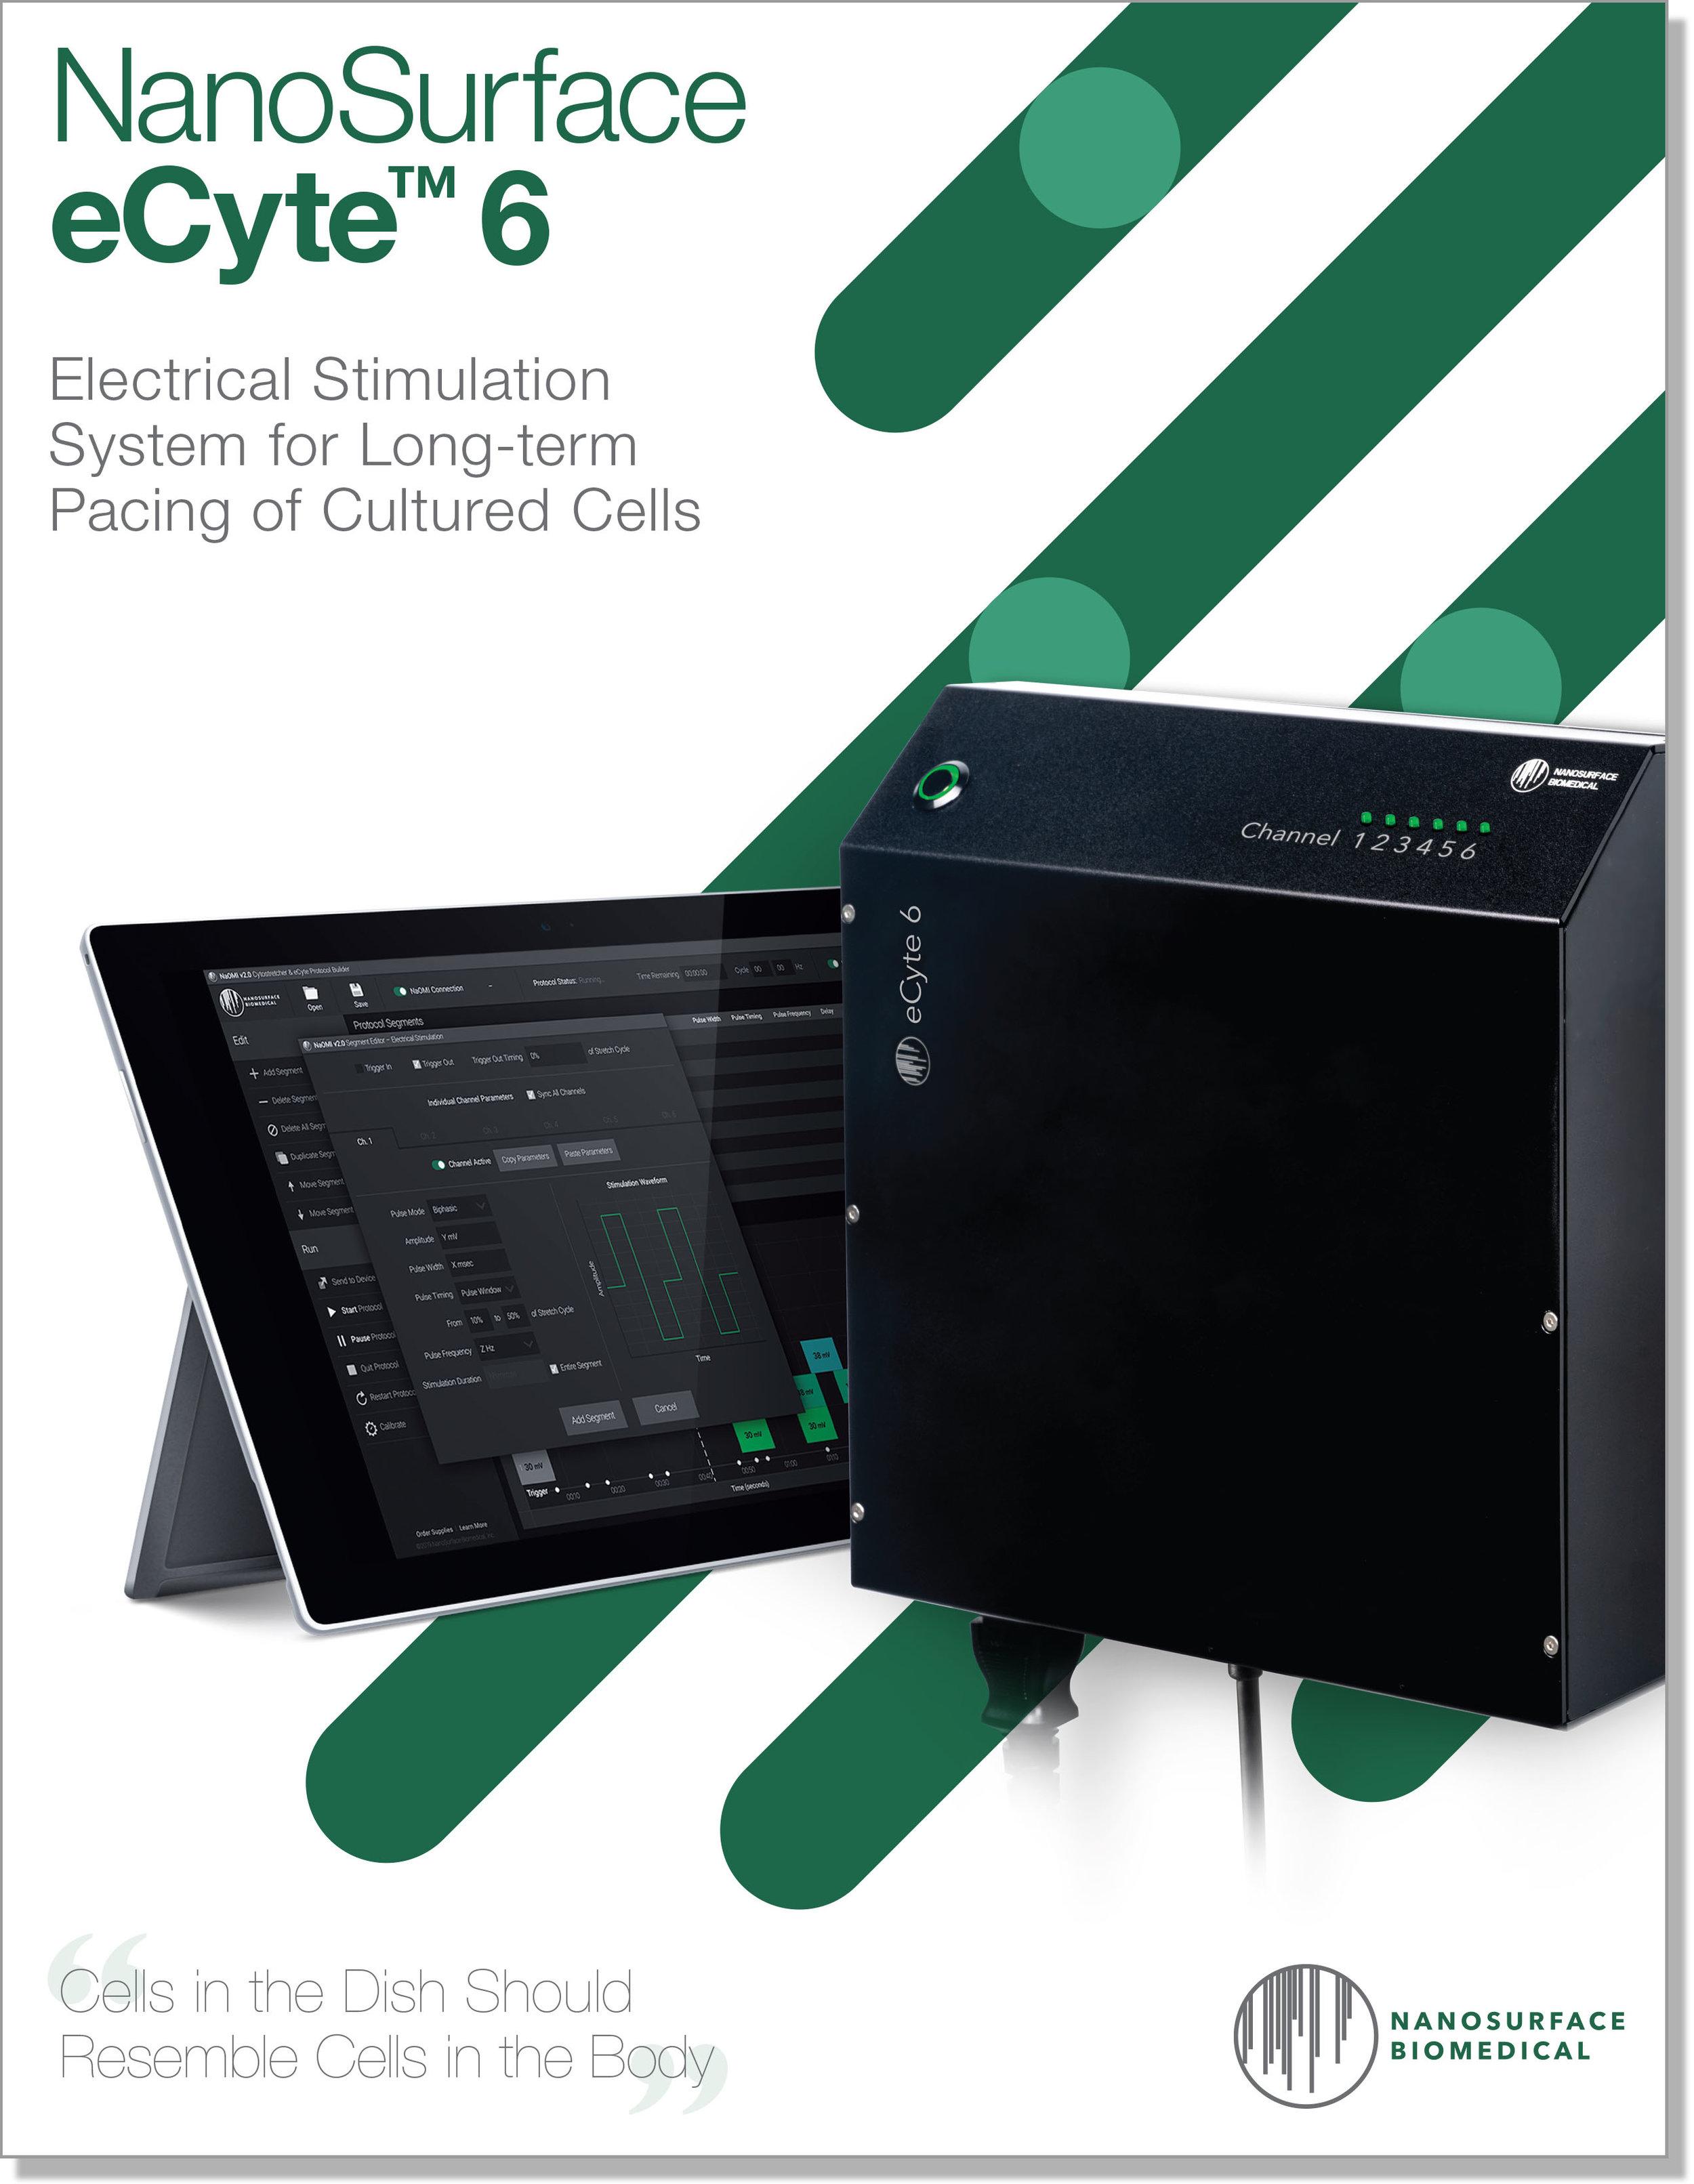 NanoSurface eCyte 6 Electrical Stimulation System Brochure - Download the NanoSurface eCyte 6 system brochure for information about the electrical stimulation system in a convenient PDF format. For additional information, please contact support@nanosurfacebio.com.